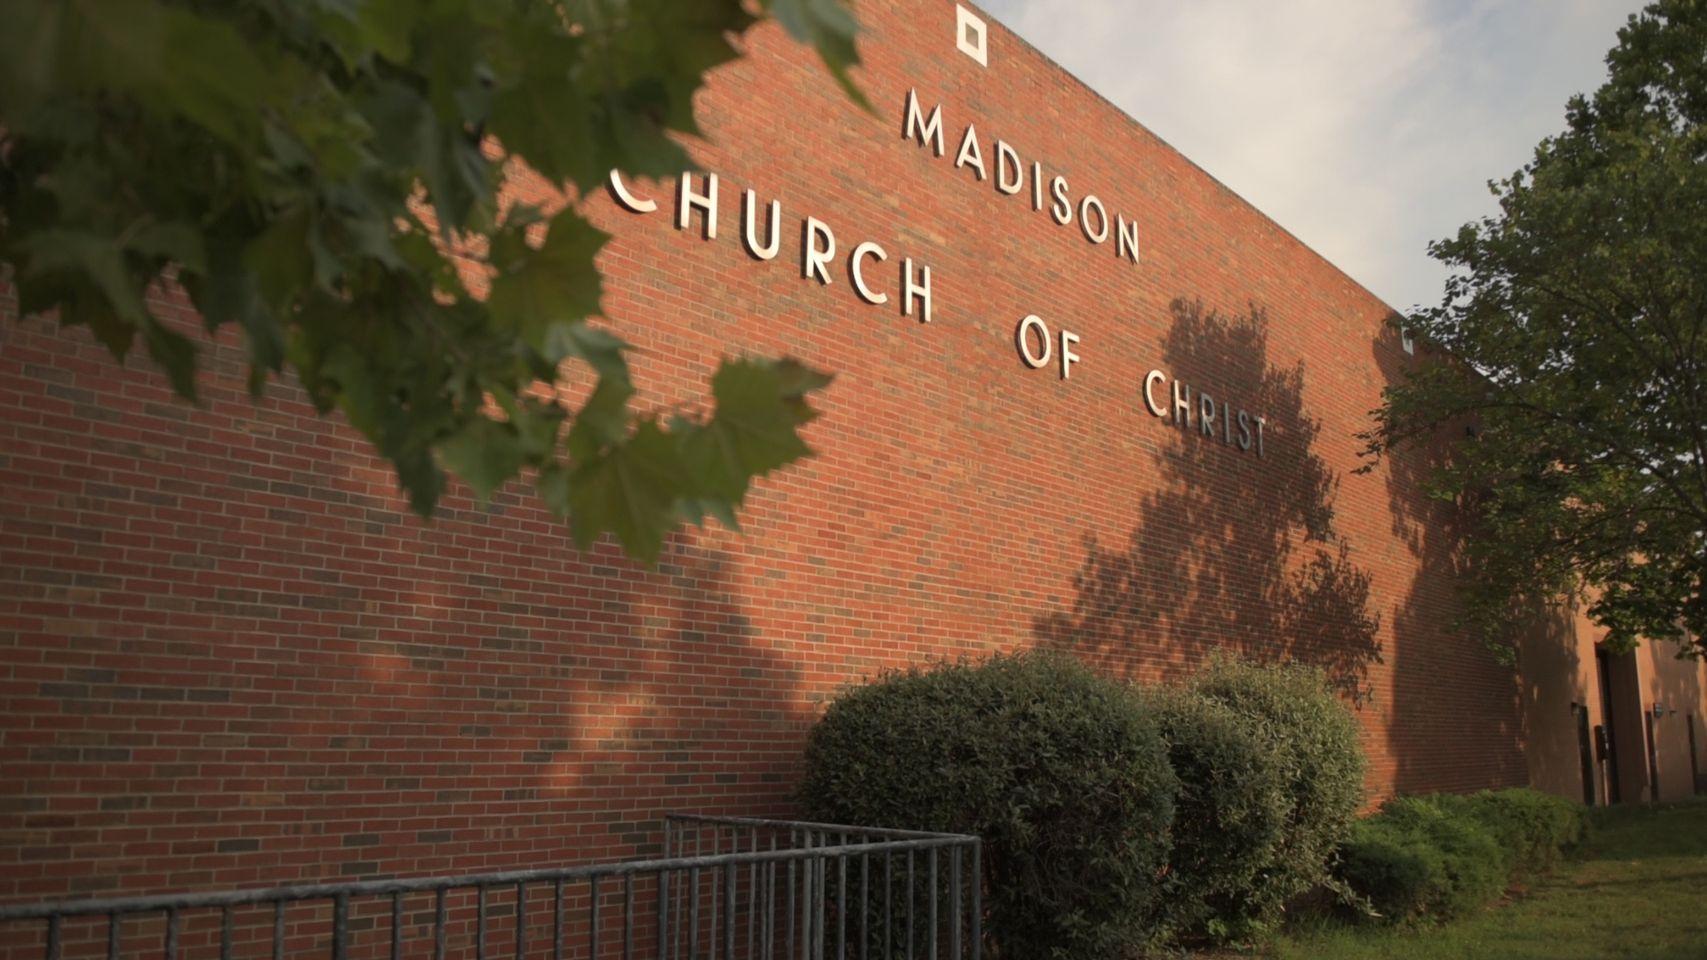 Madison Church Of Christ - Benevolence Center